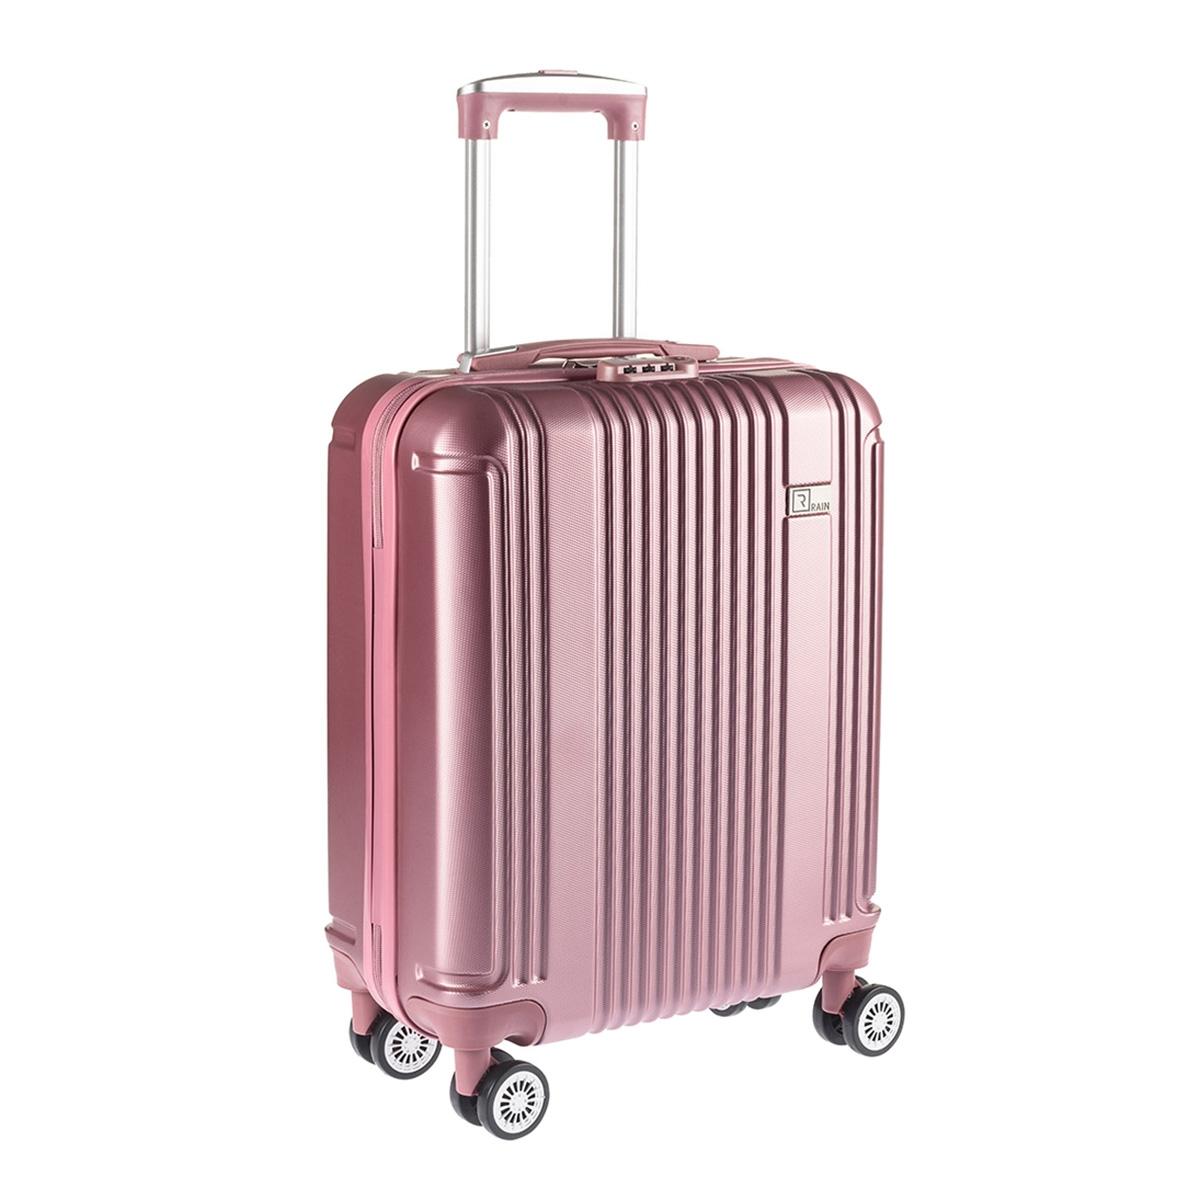 0dd3998f19 Βαλίτσα Καμπίνας Σκληρή ABS 4 Ρόδες Rain RB9028C Ροζ